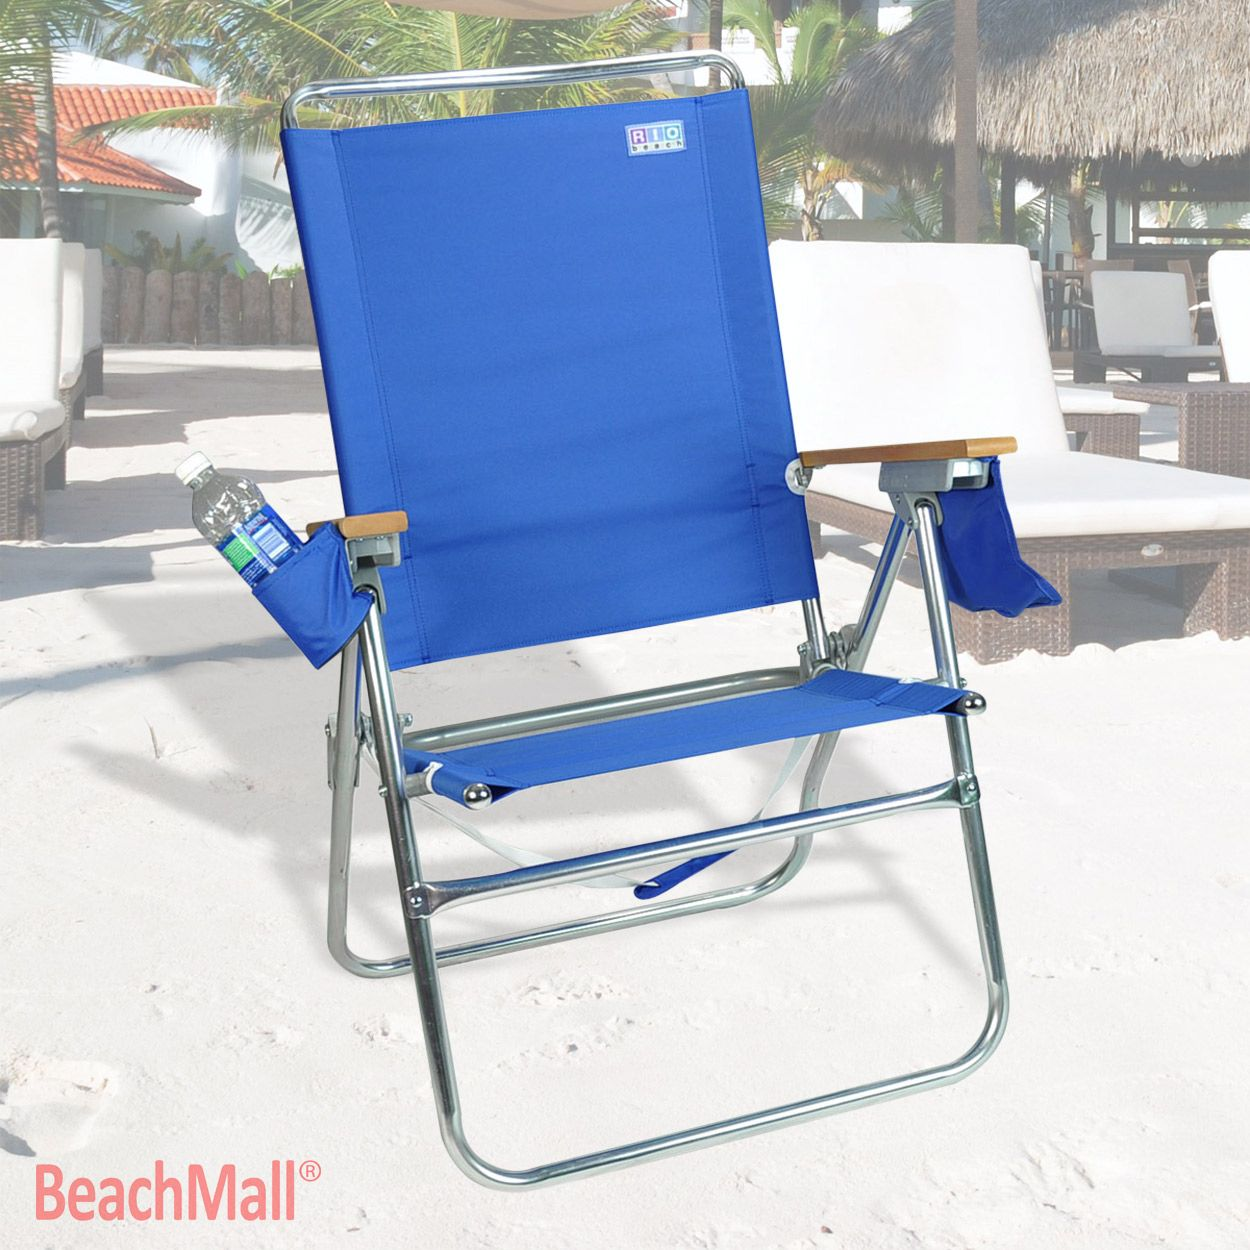 Superbe Rio High Boy Beach Chair   7 Positions $68.95 Beachmall.com